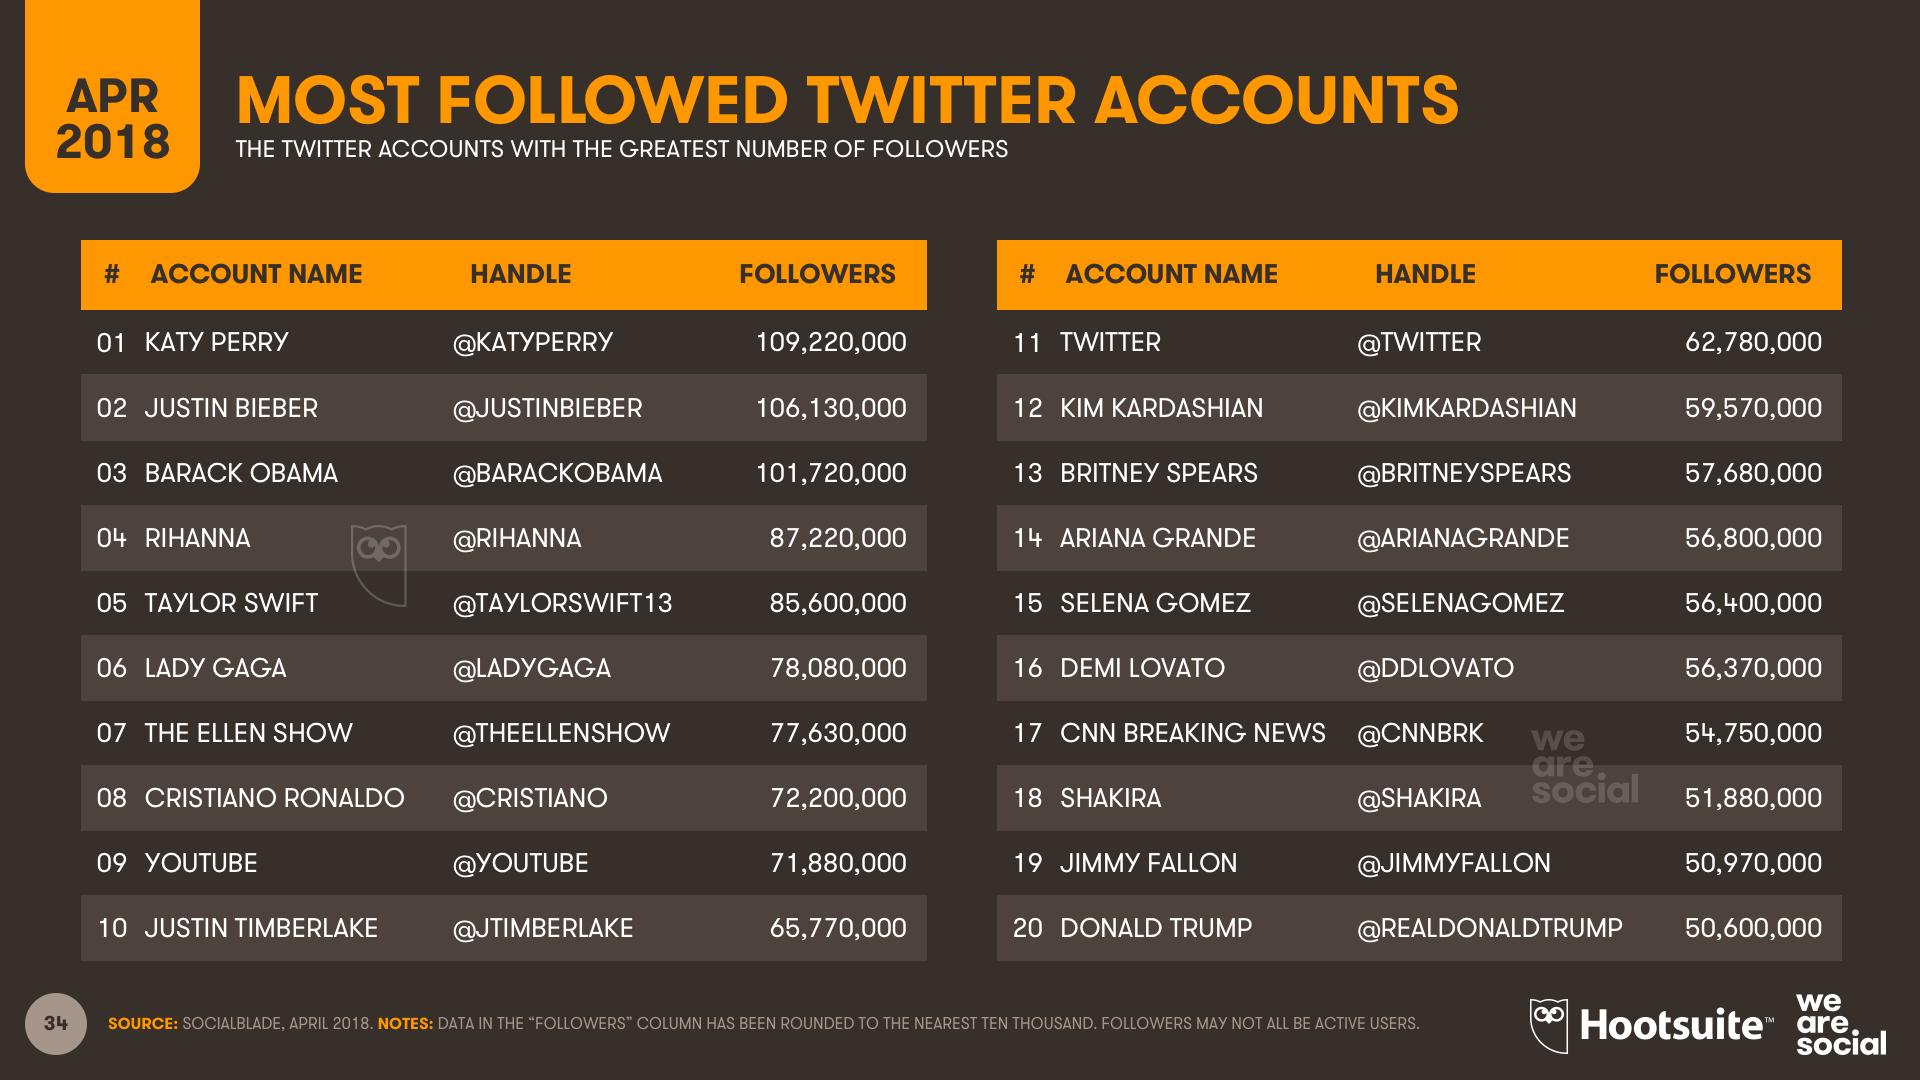 Twitter Most Followed Accounts April 2018 DataReportal